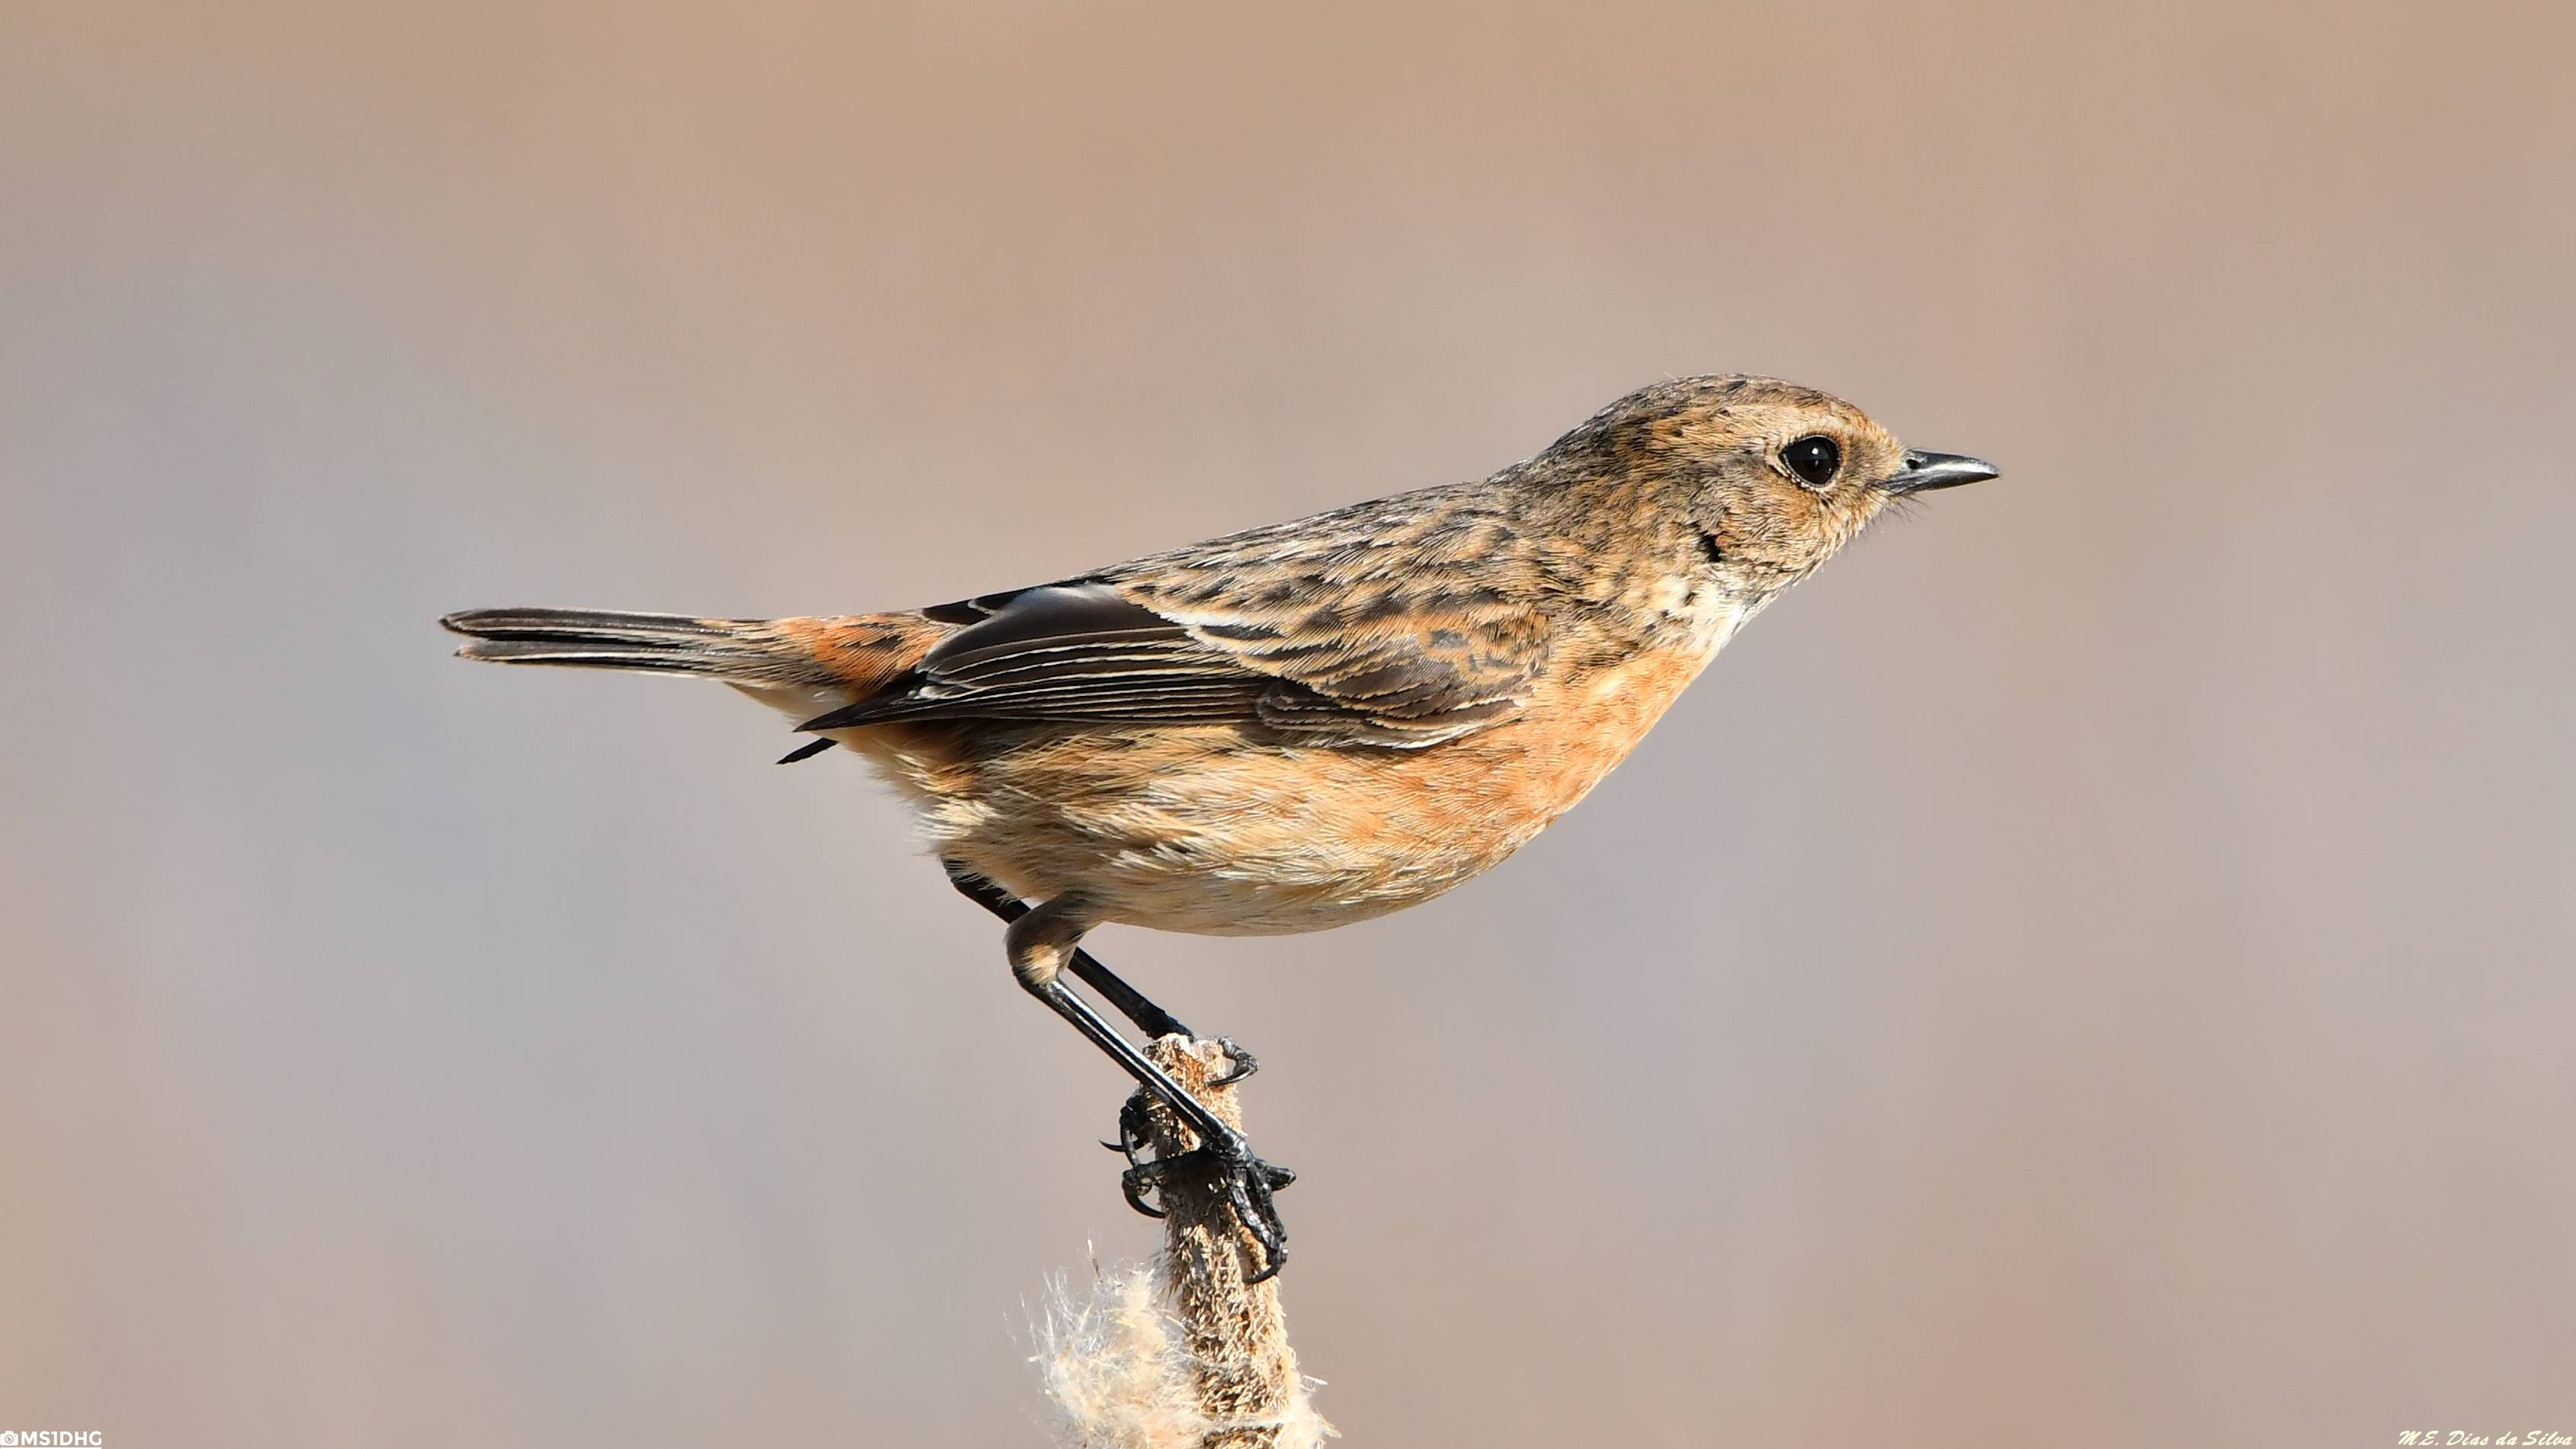 Fórum Aves - Birdwatching em Portugal - Portal Cartaxo-comum%20(80)